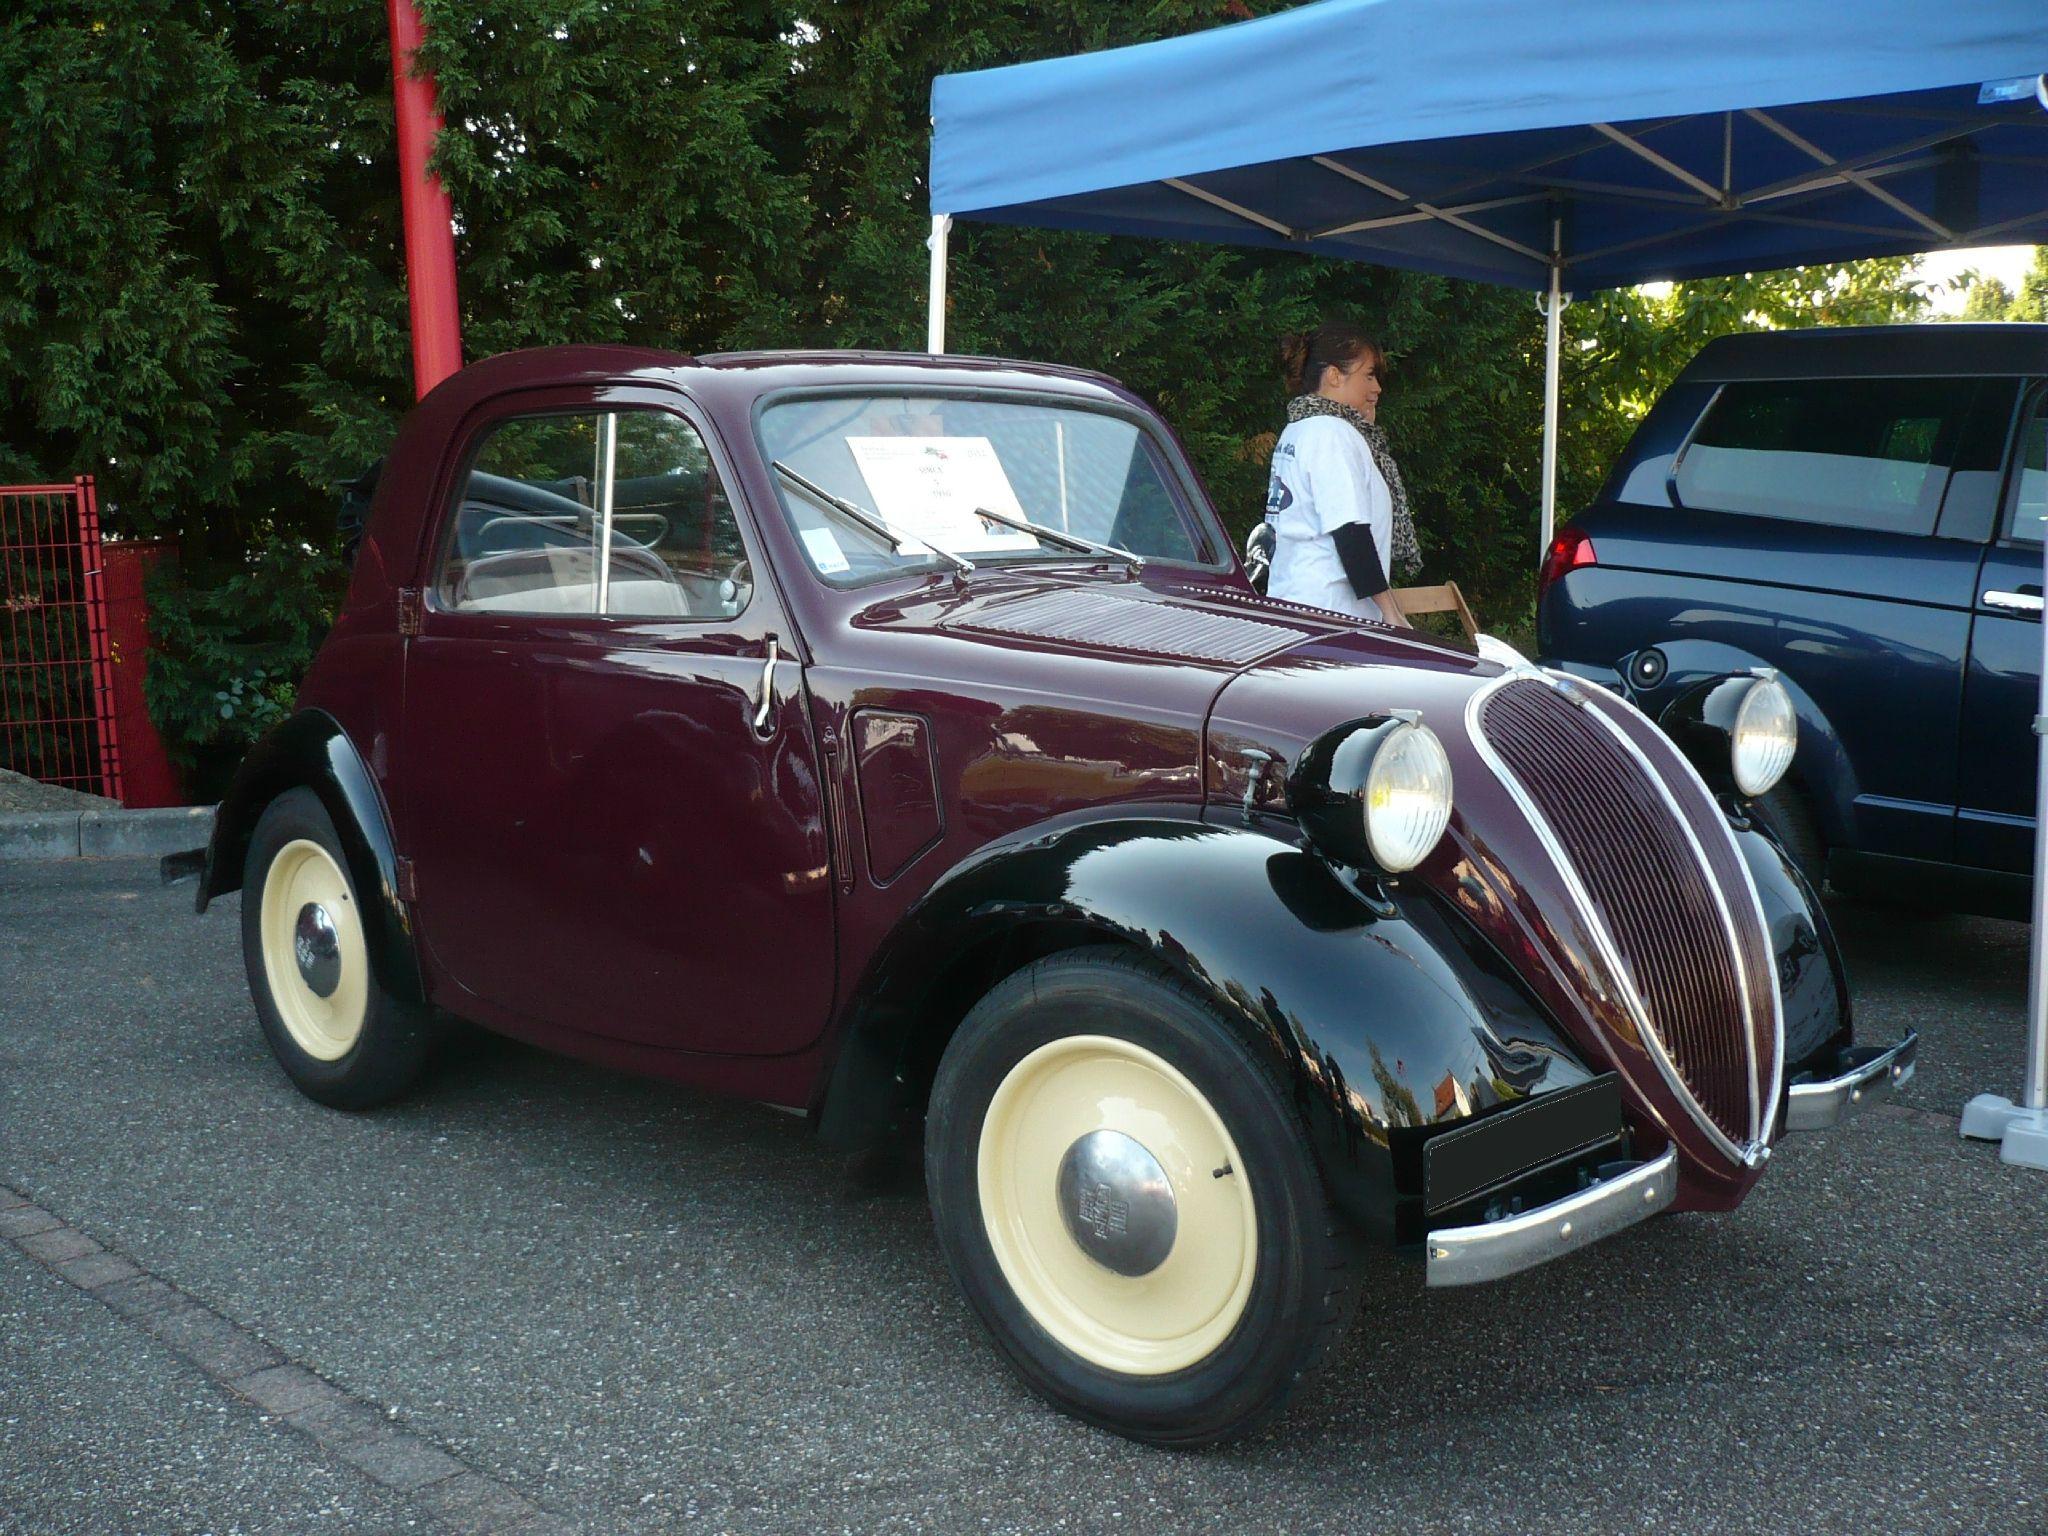 Simca 1940s Simca 5 Decouvrable 1940 Vroom Vroom Simca Voitures Classiques Voitures Retro